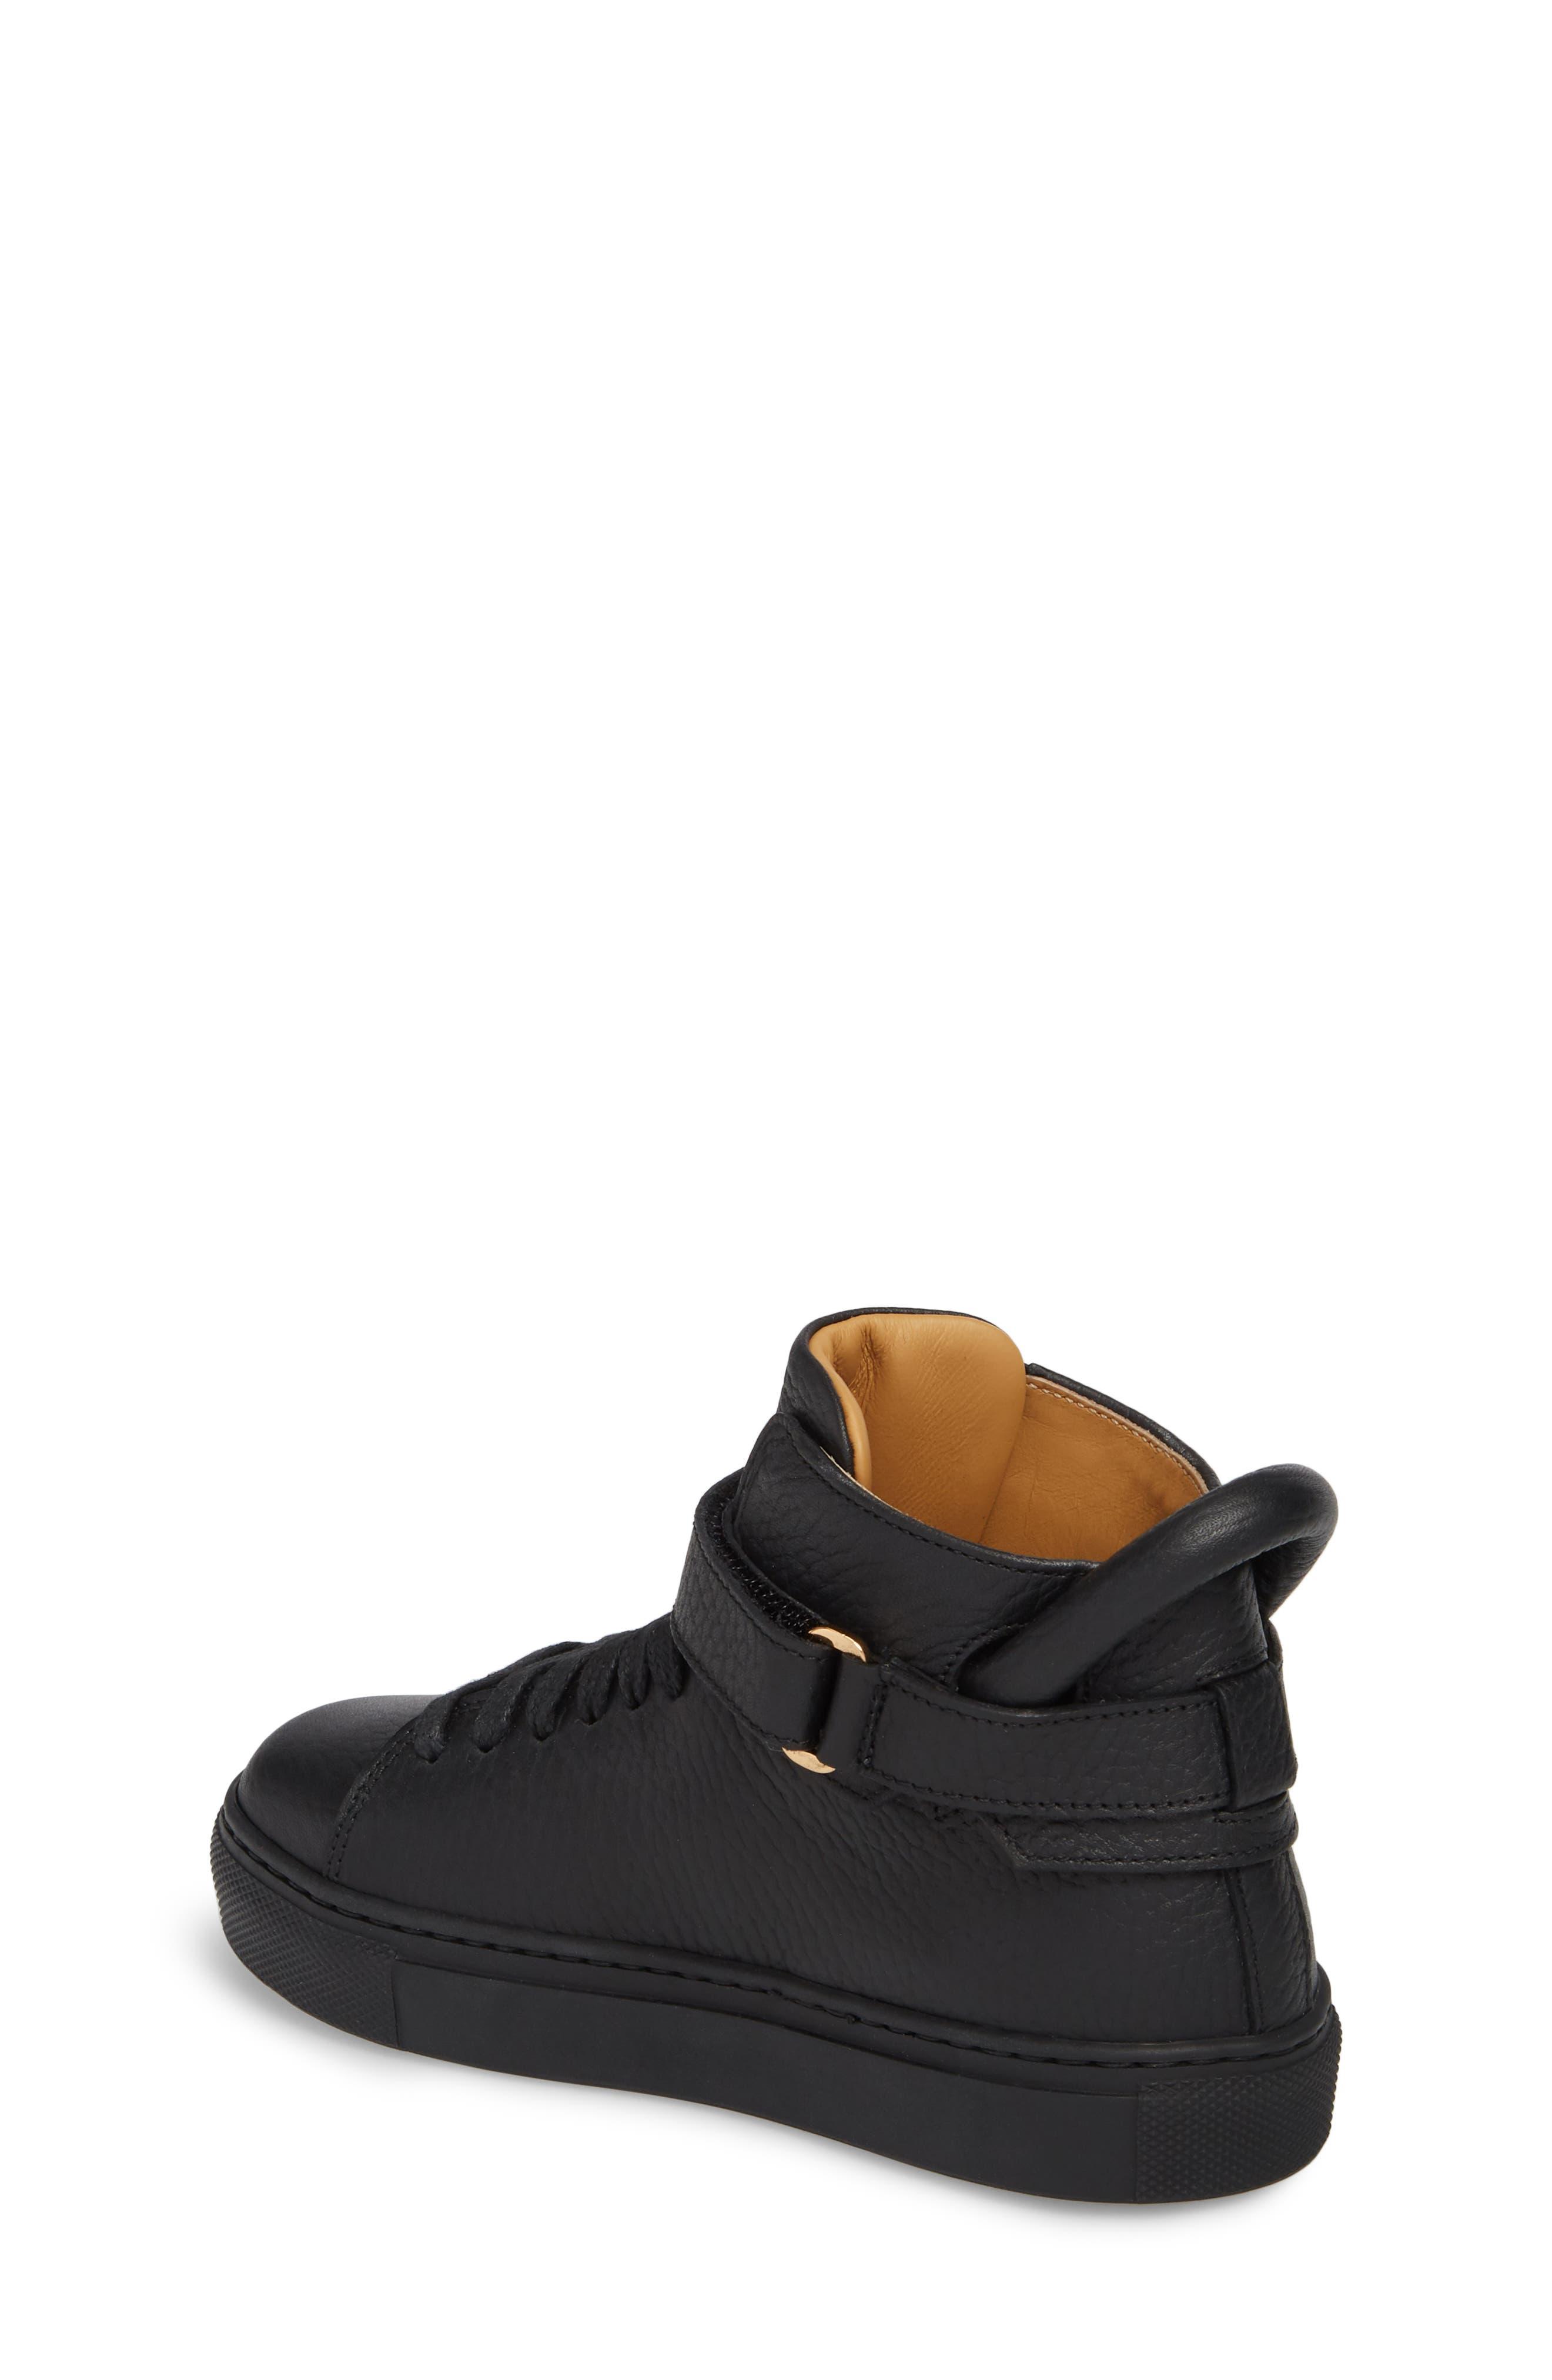 High Top Sneaker,                             Alternate thumbnail 2, color,                             Black